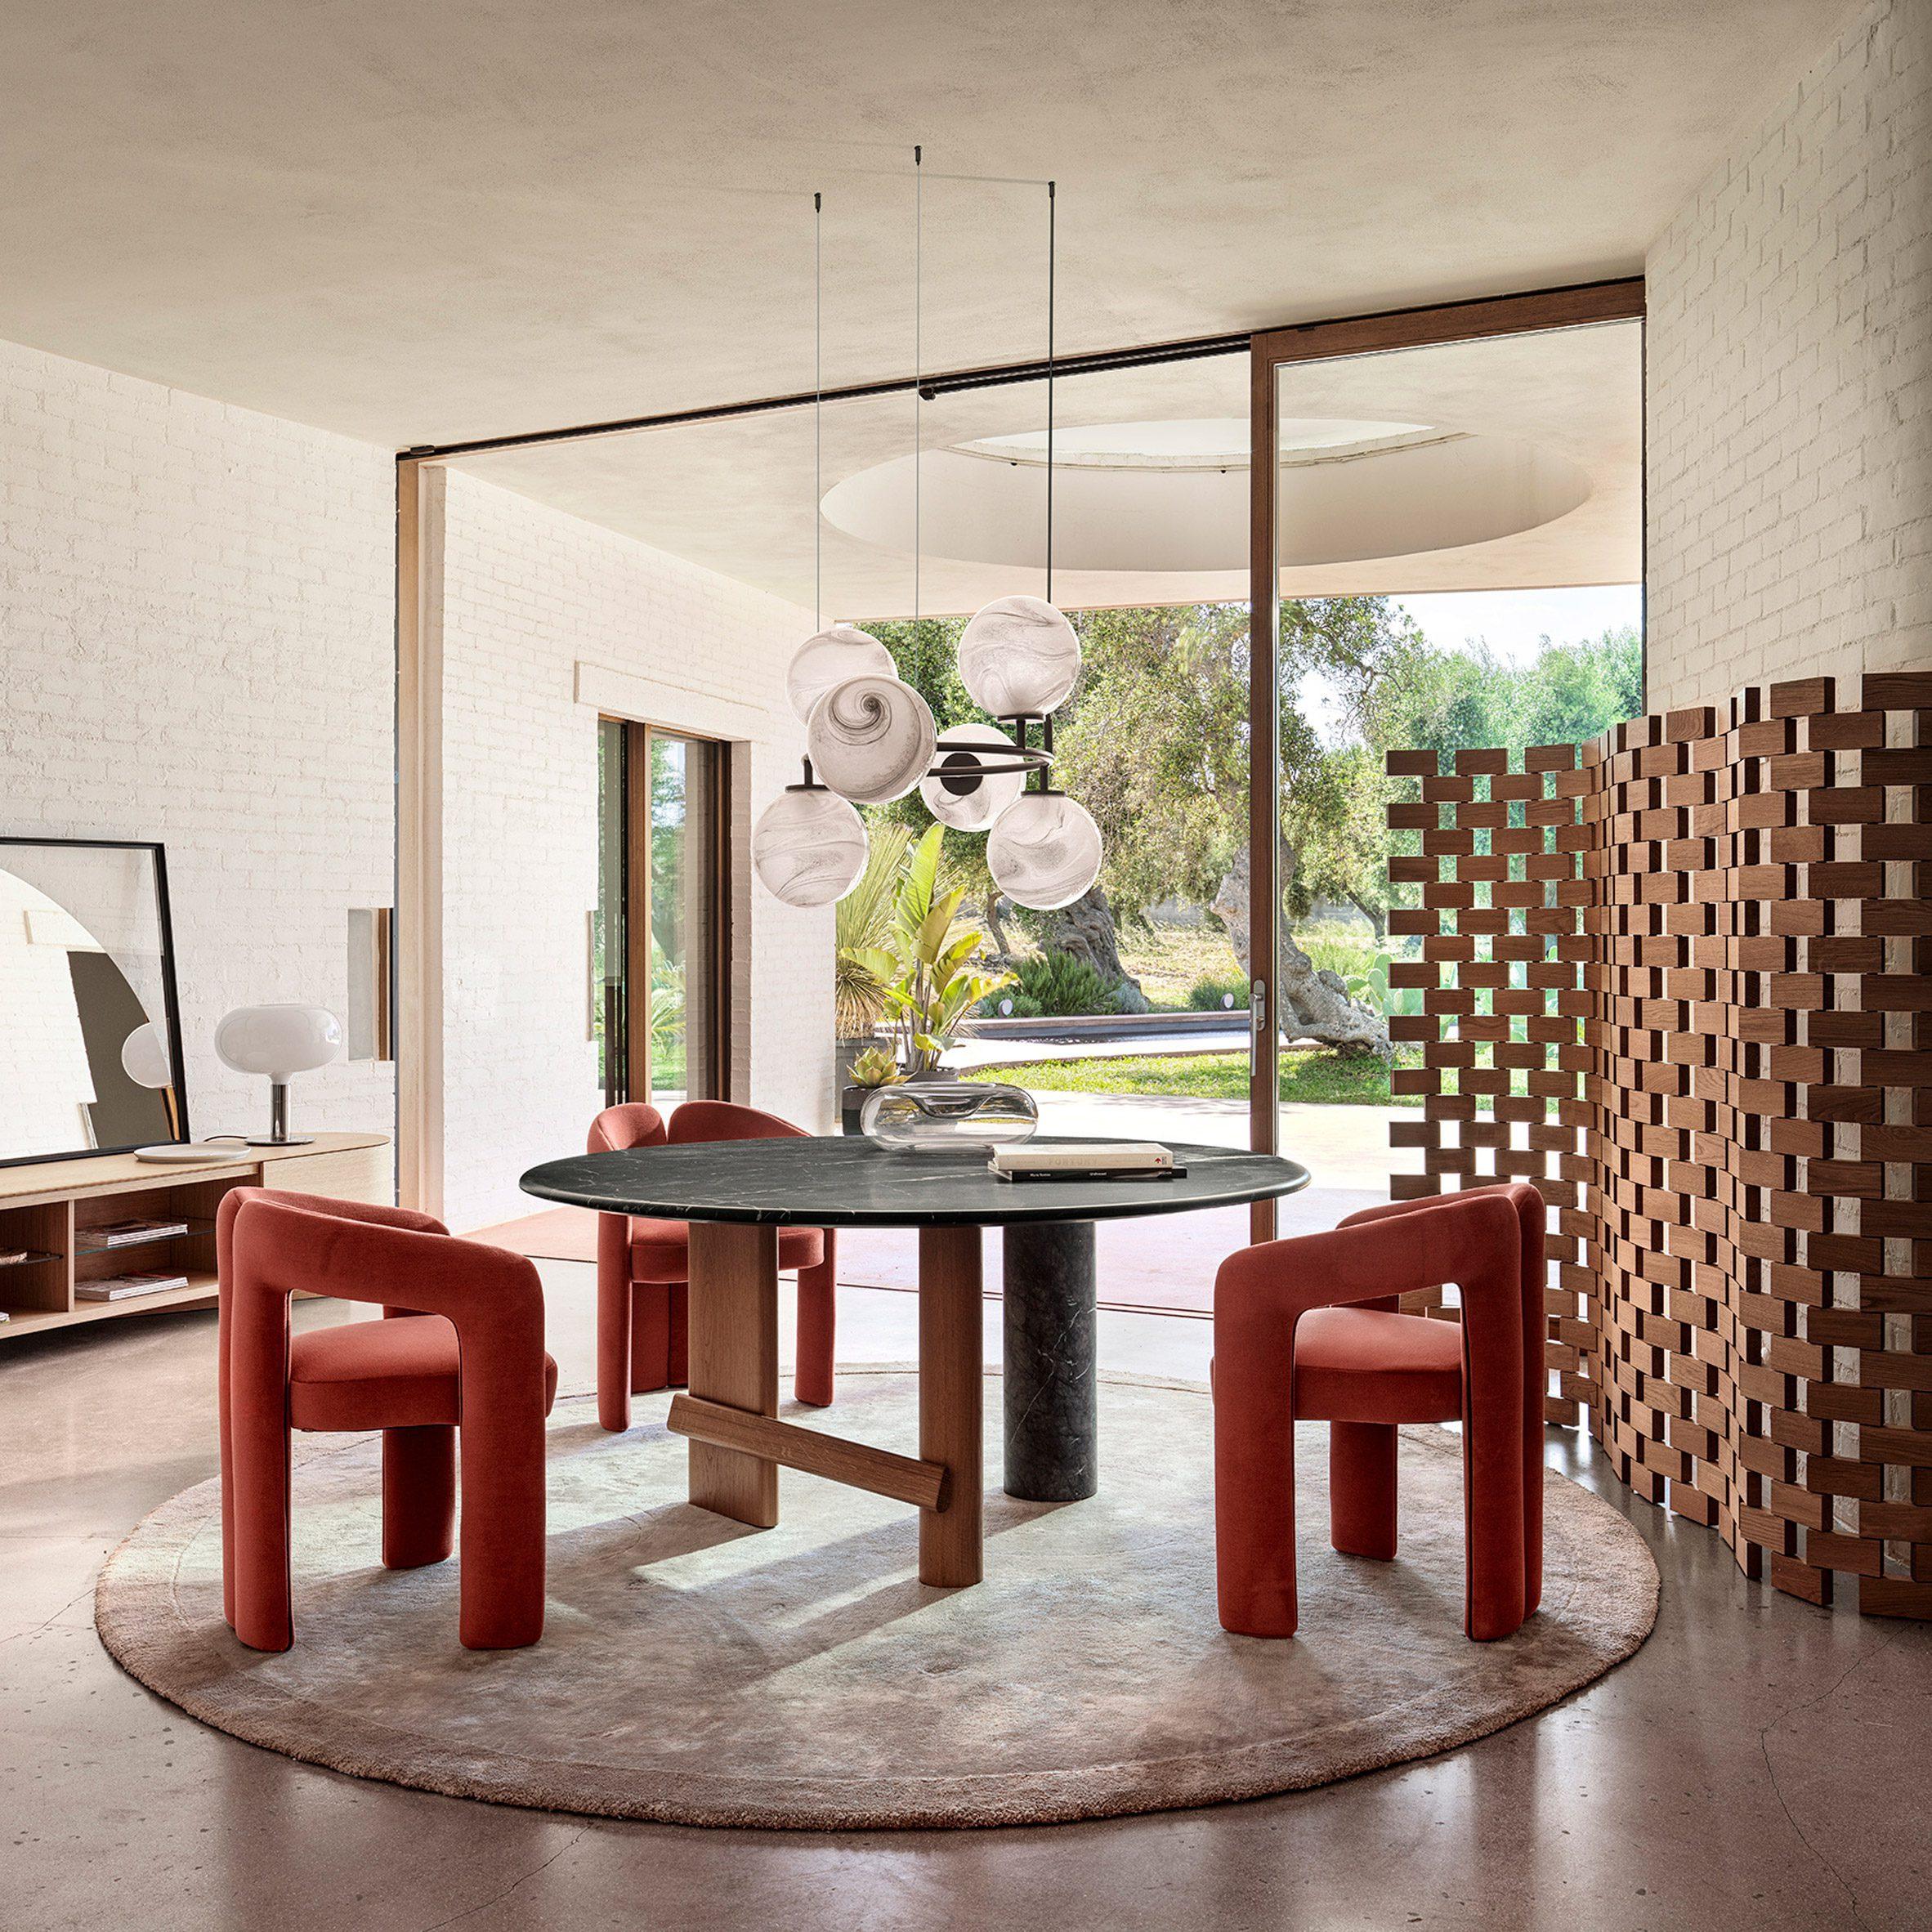 A photograph of the Sengu Table